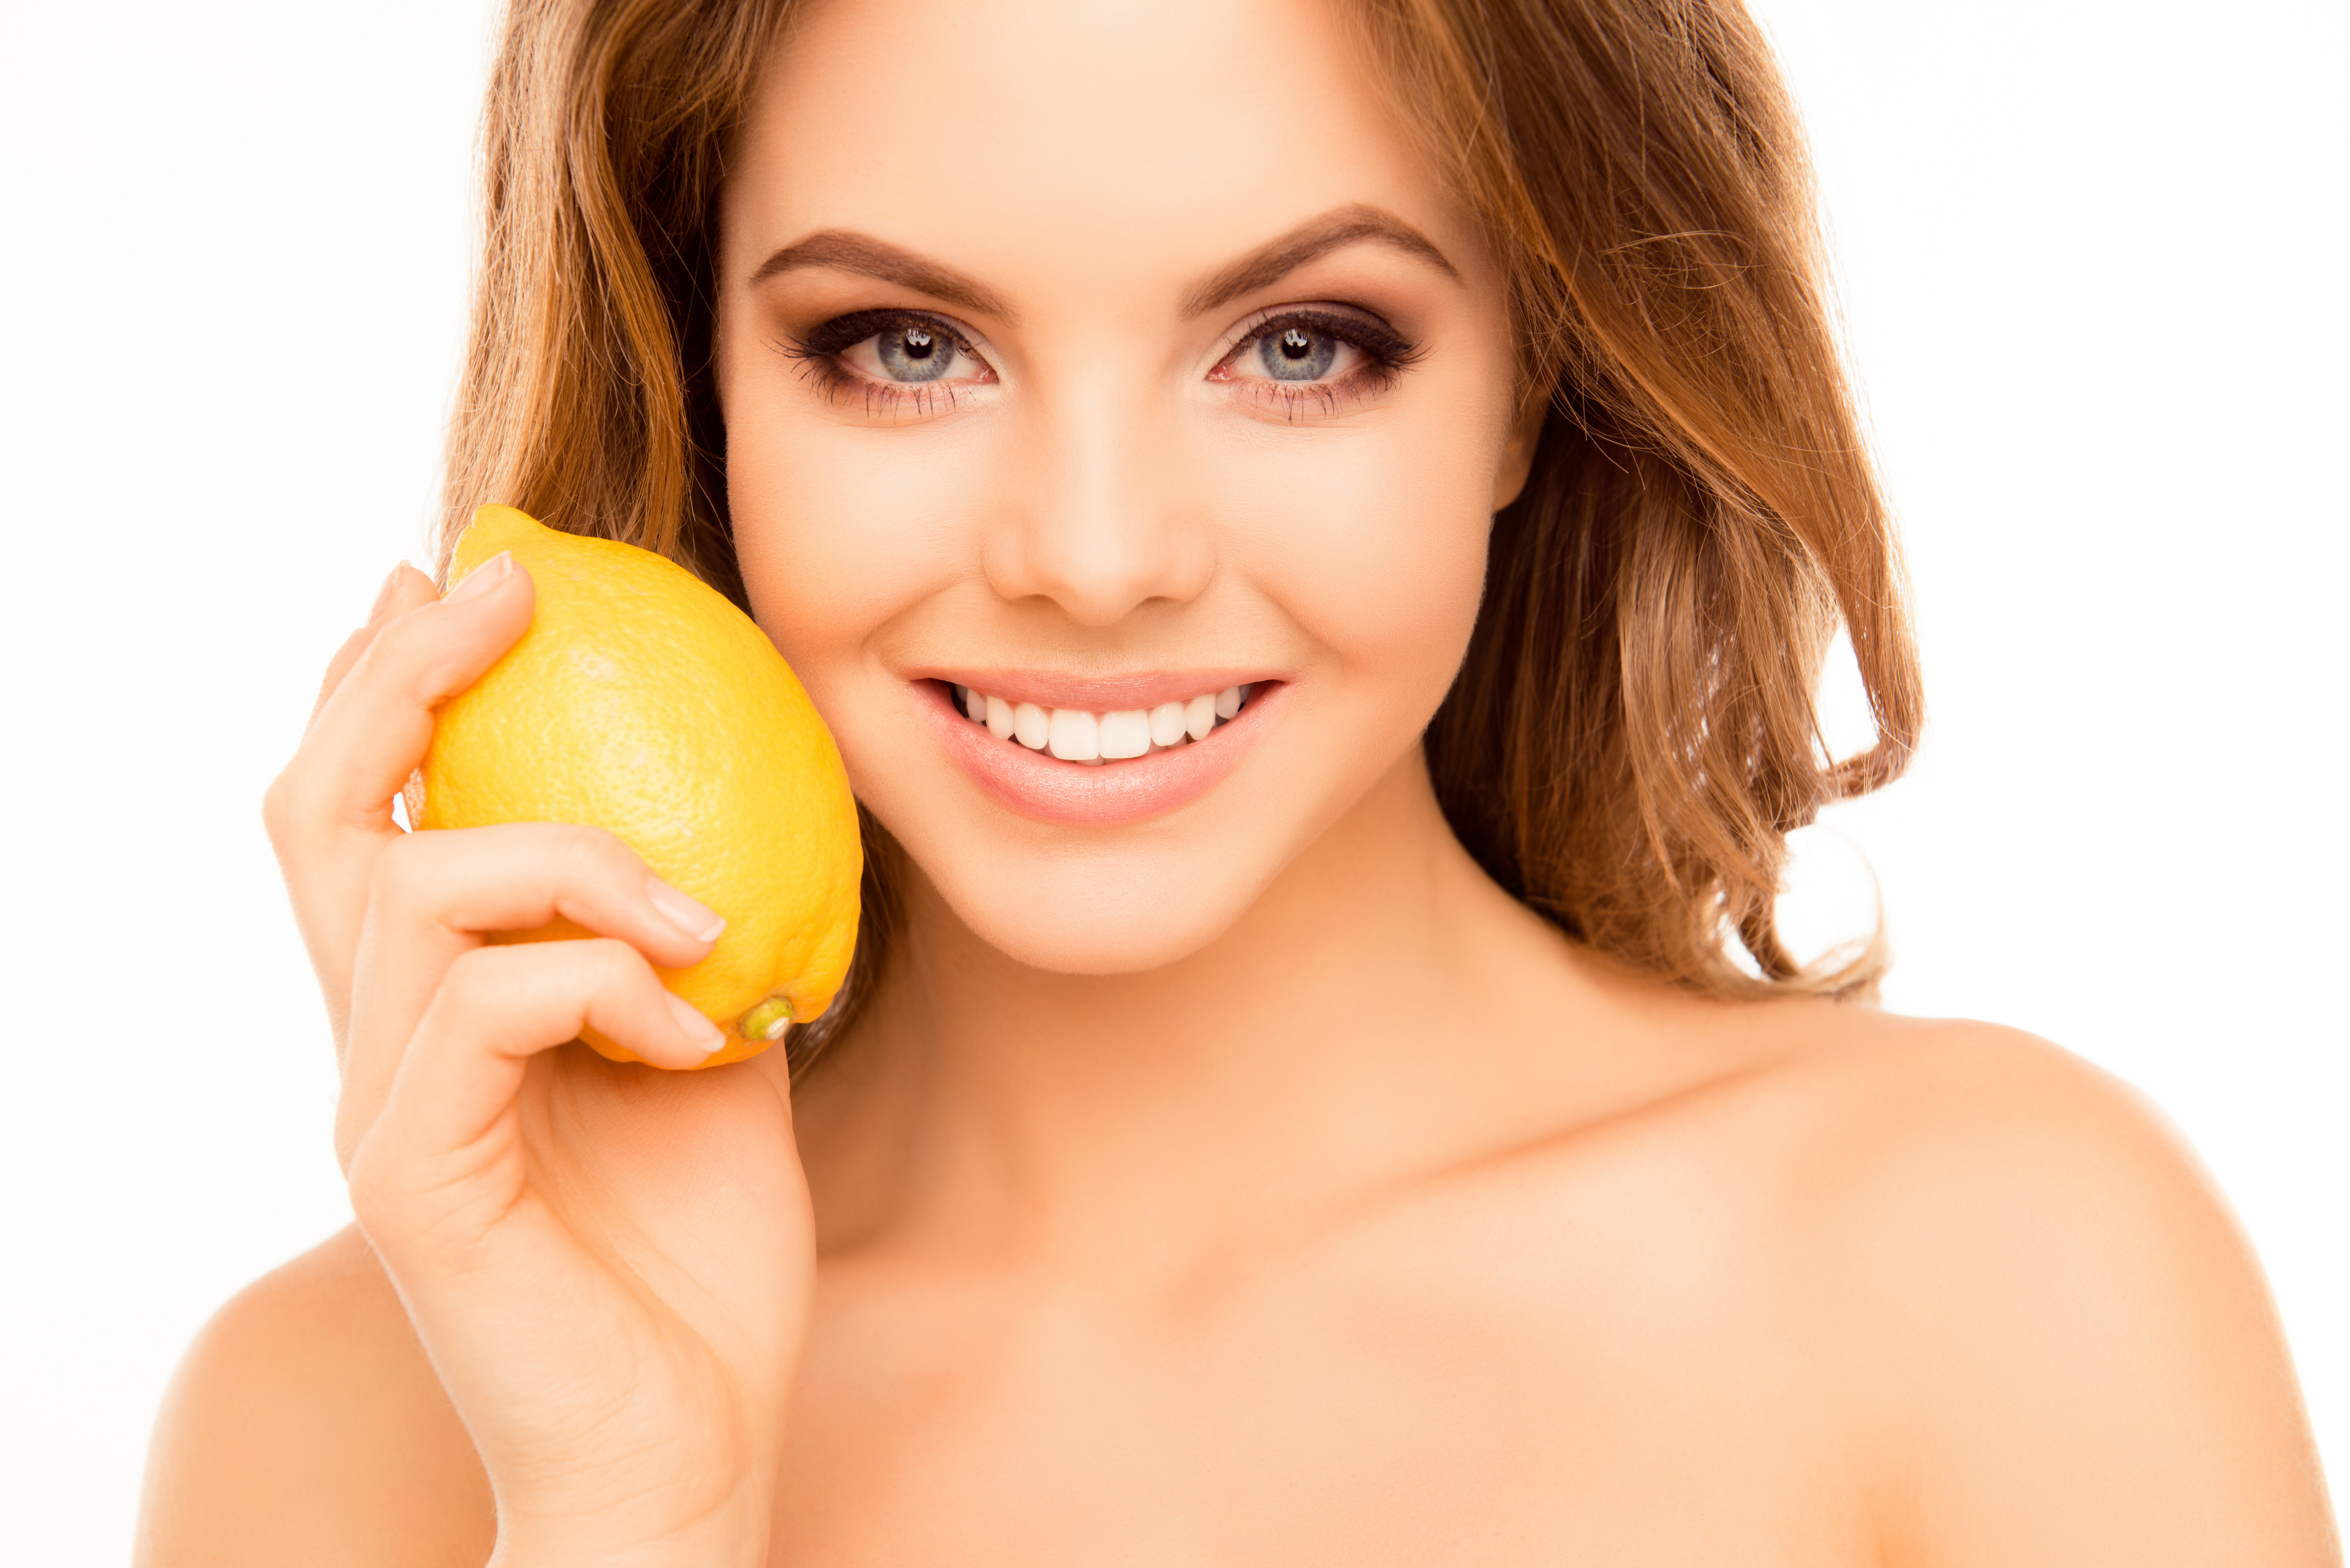 zabiegi/portrait-of-beautiful-sensitive-woman-holding-lemon-near-face-947965012-7360x4912.jpeg